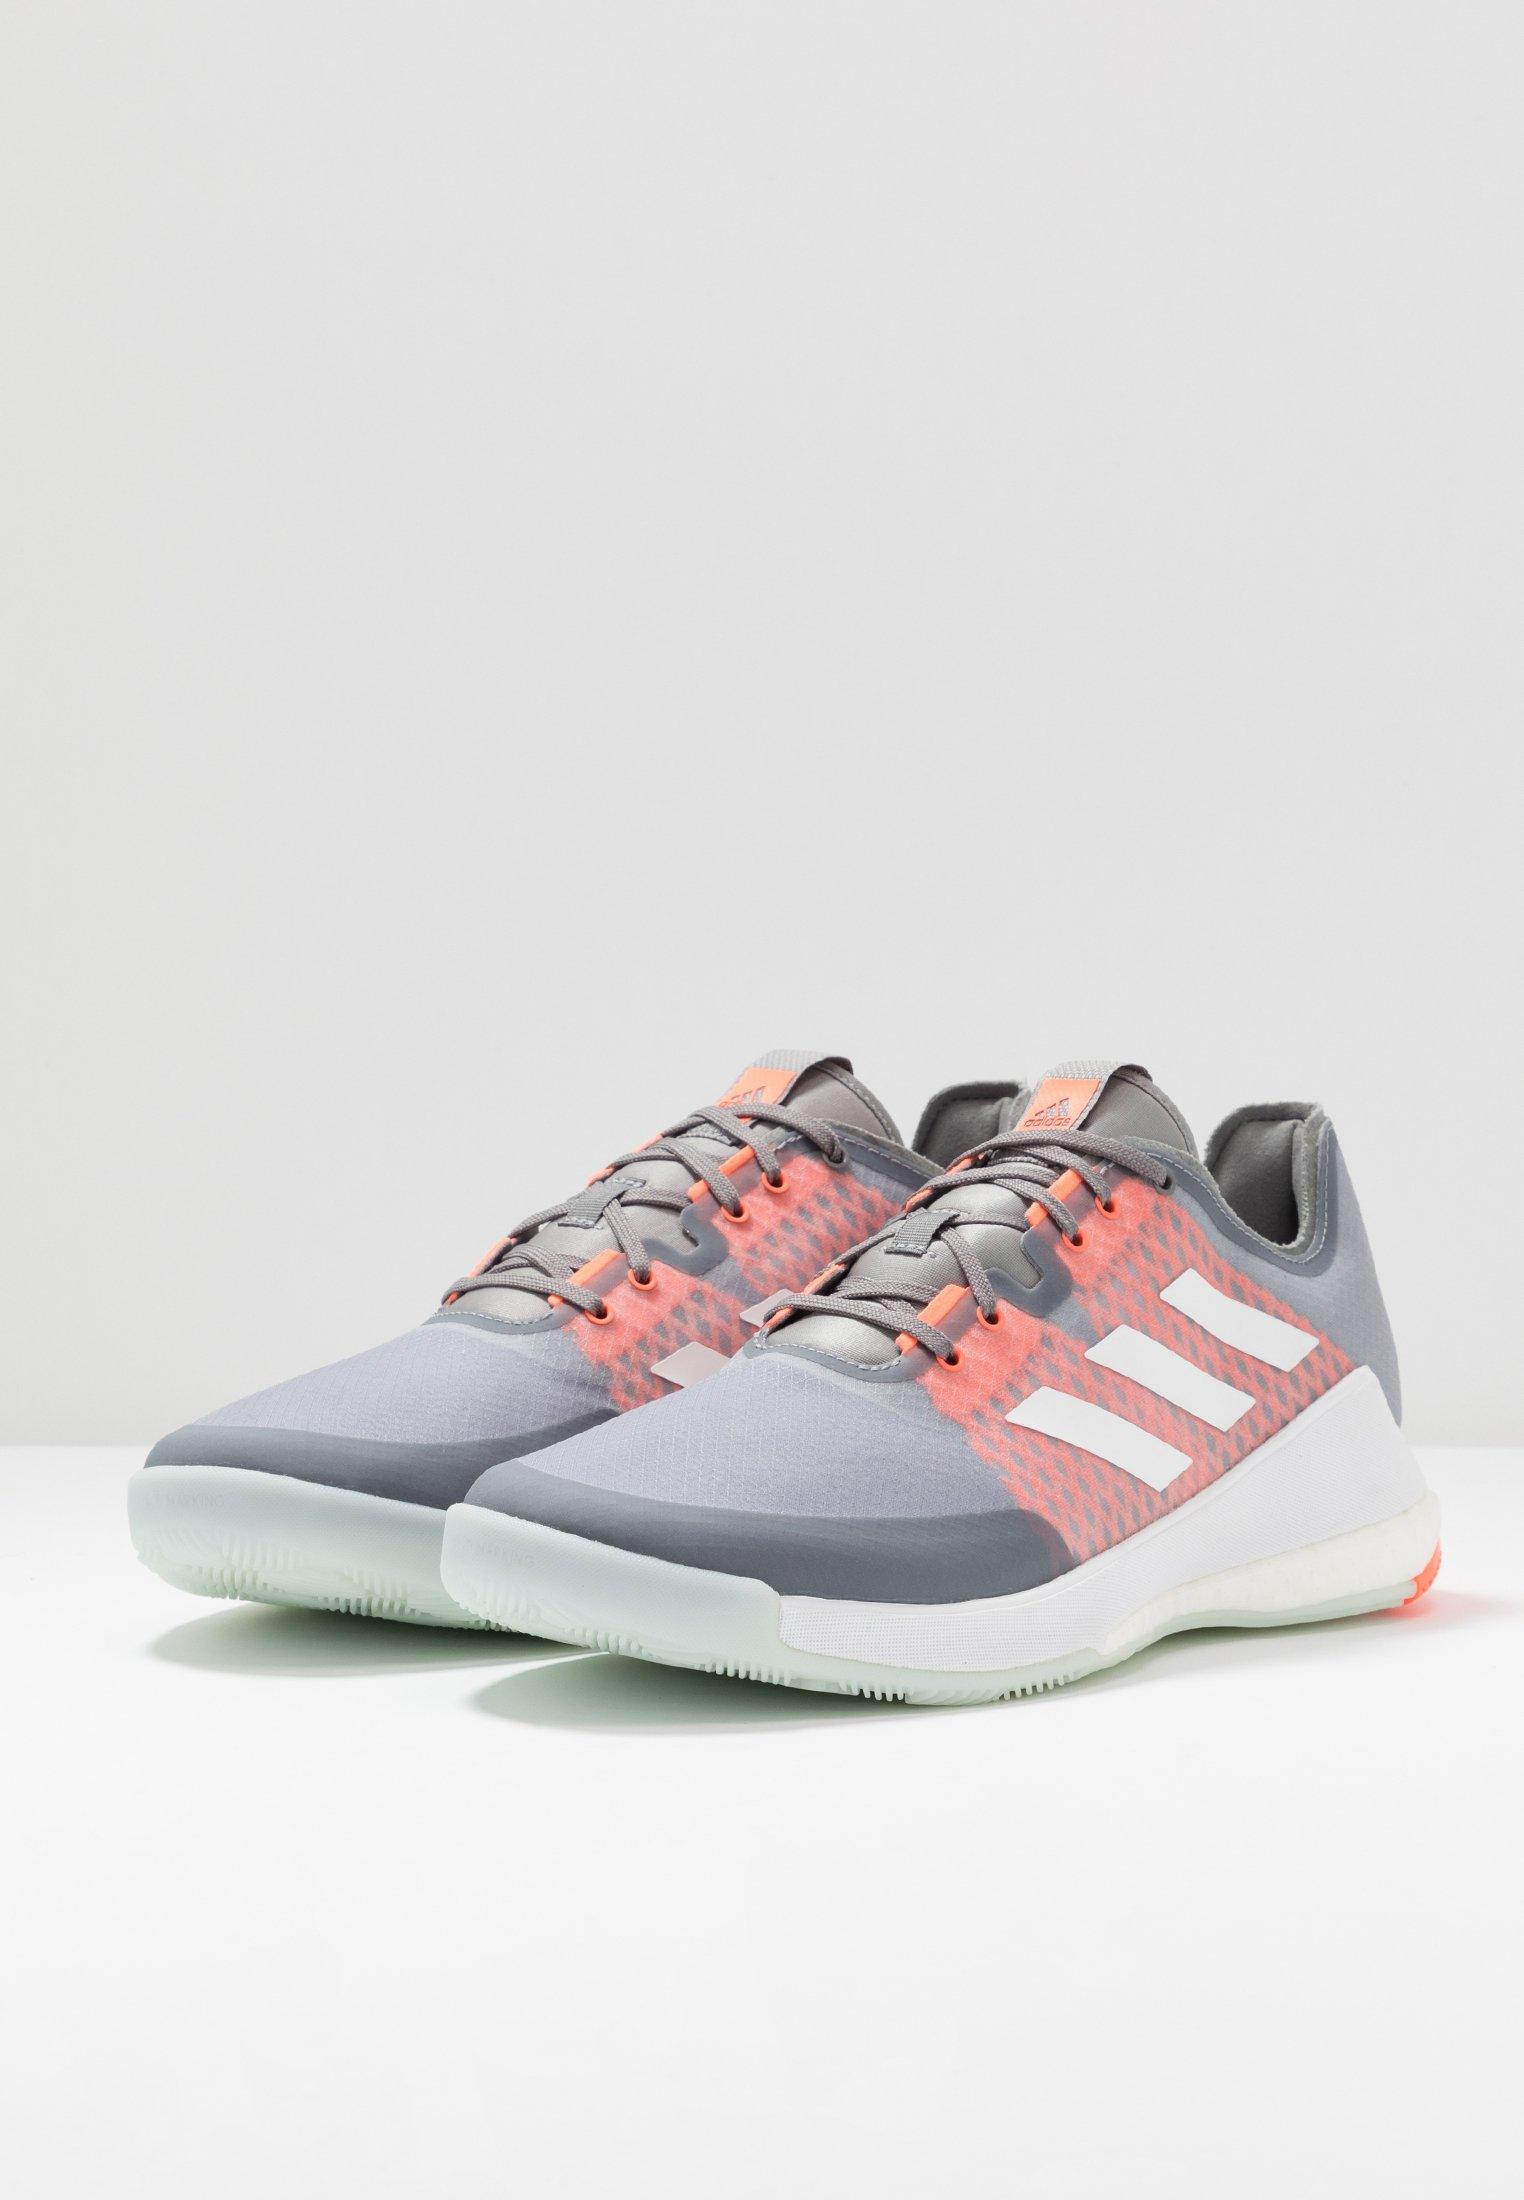 adidas Performance CRAZY FLIGHT BOOST INDOOR SPORTS SHOES - Volleyballschuh - grey three/footwear white/signal coral/grau - Herrenschuhe VHKU1